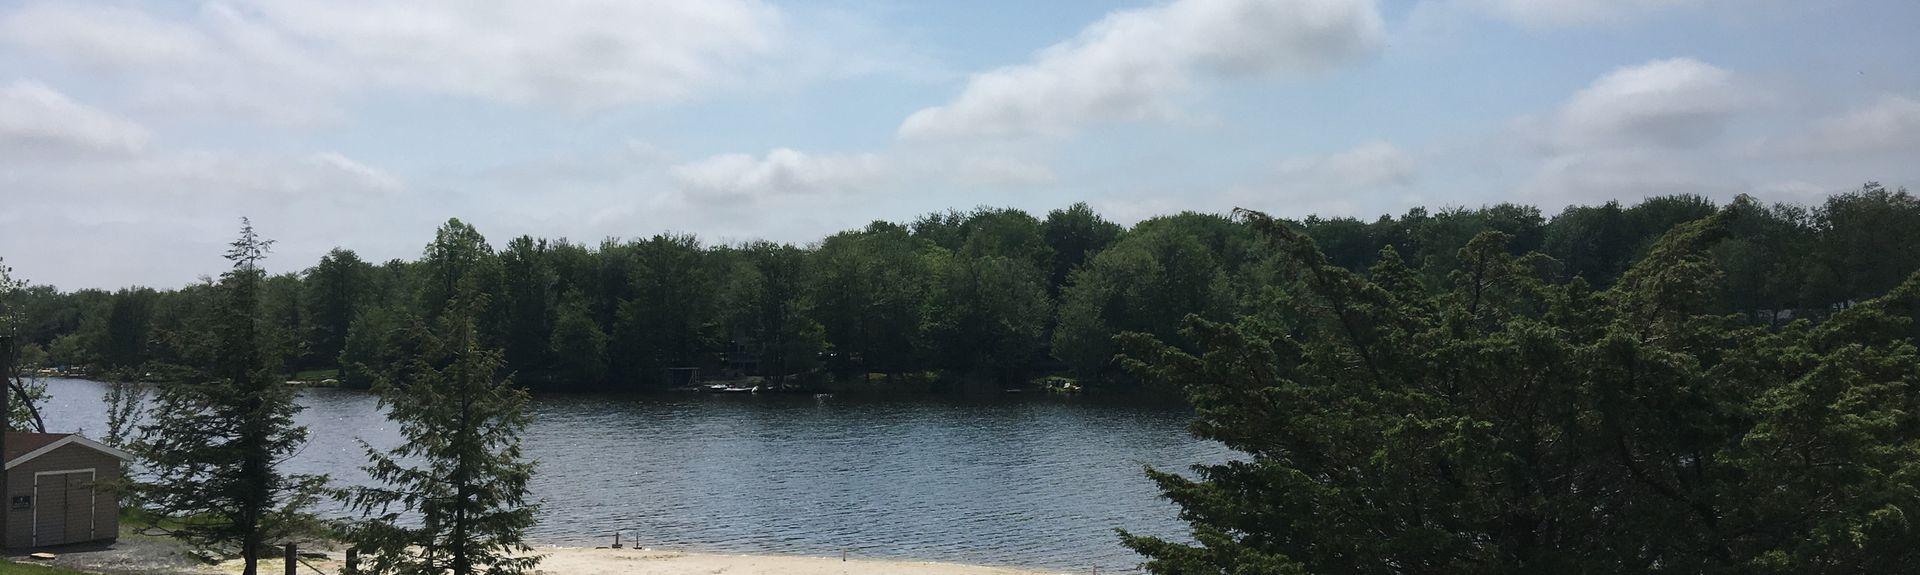 Camelbeach Mountain Waterpark, Tannersville, PA, USA